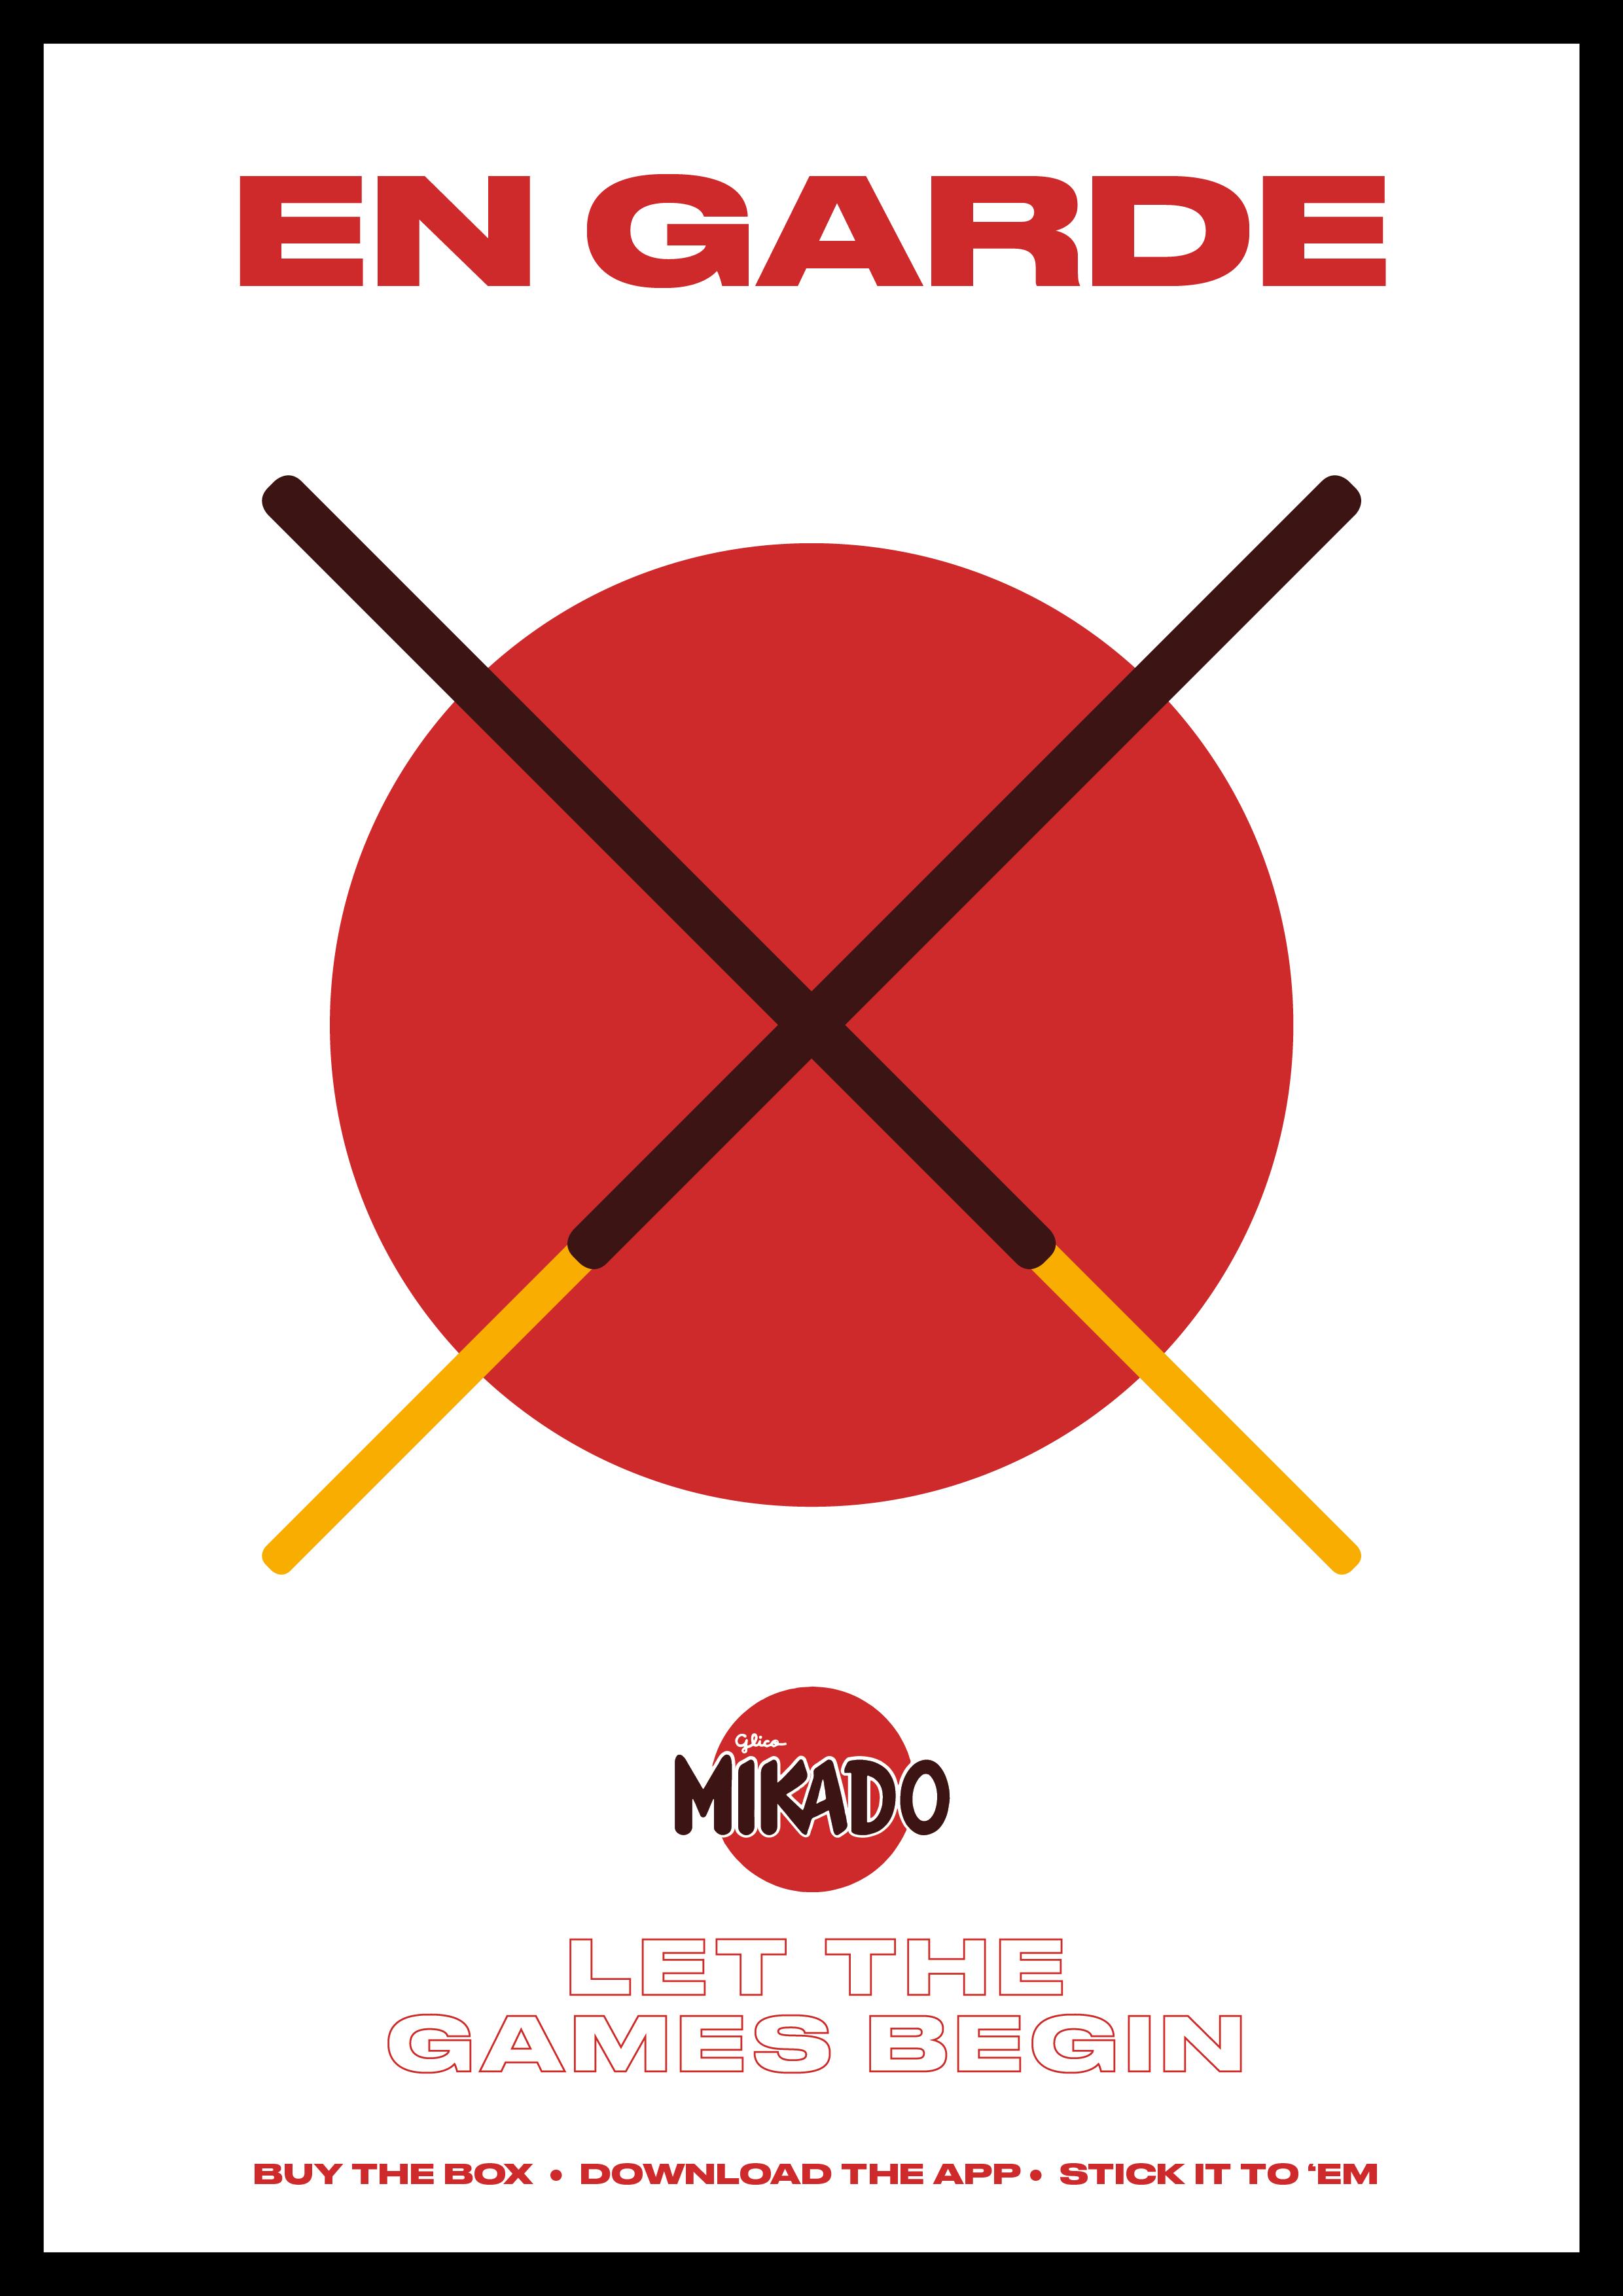 Mikado Poster 1.png